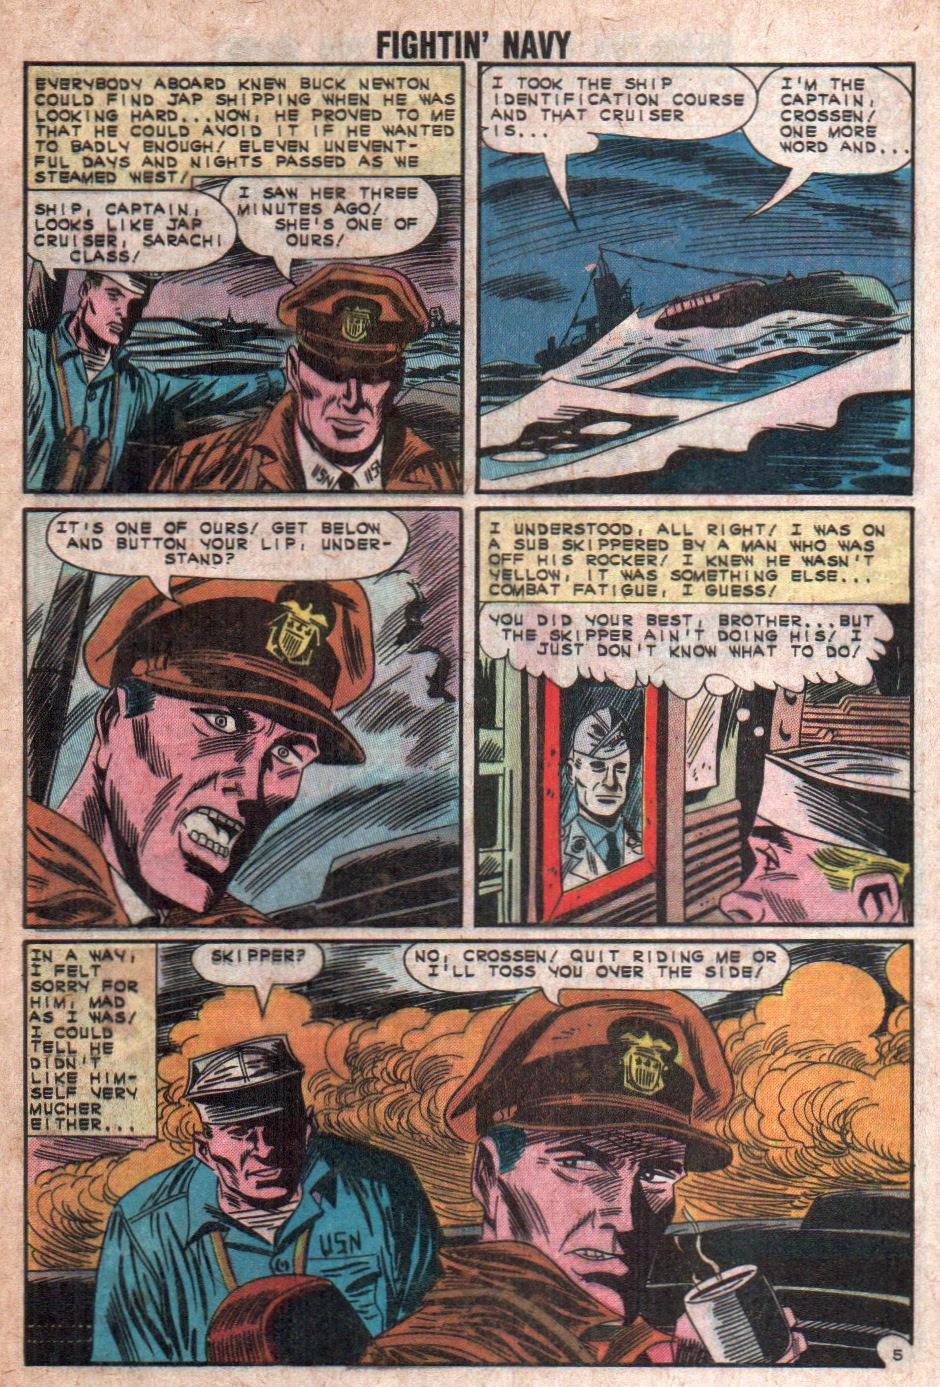 Read online Fightin' Navy comic -  Issue #108 - 8